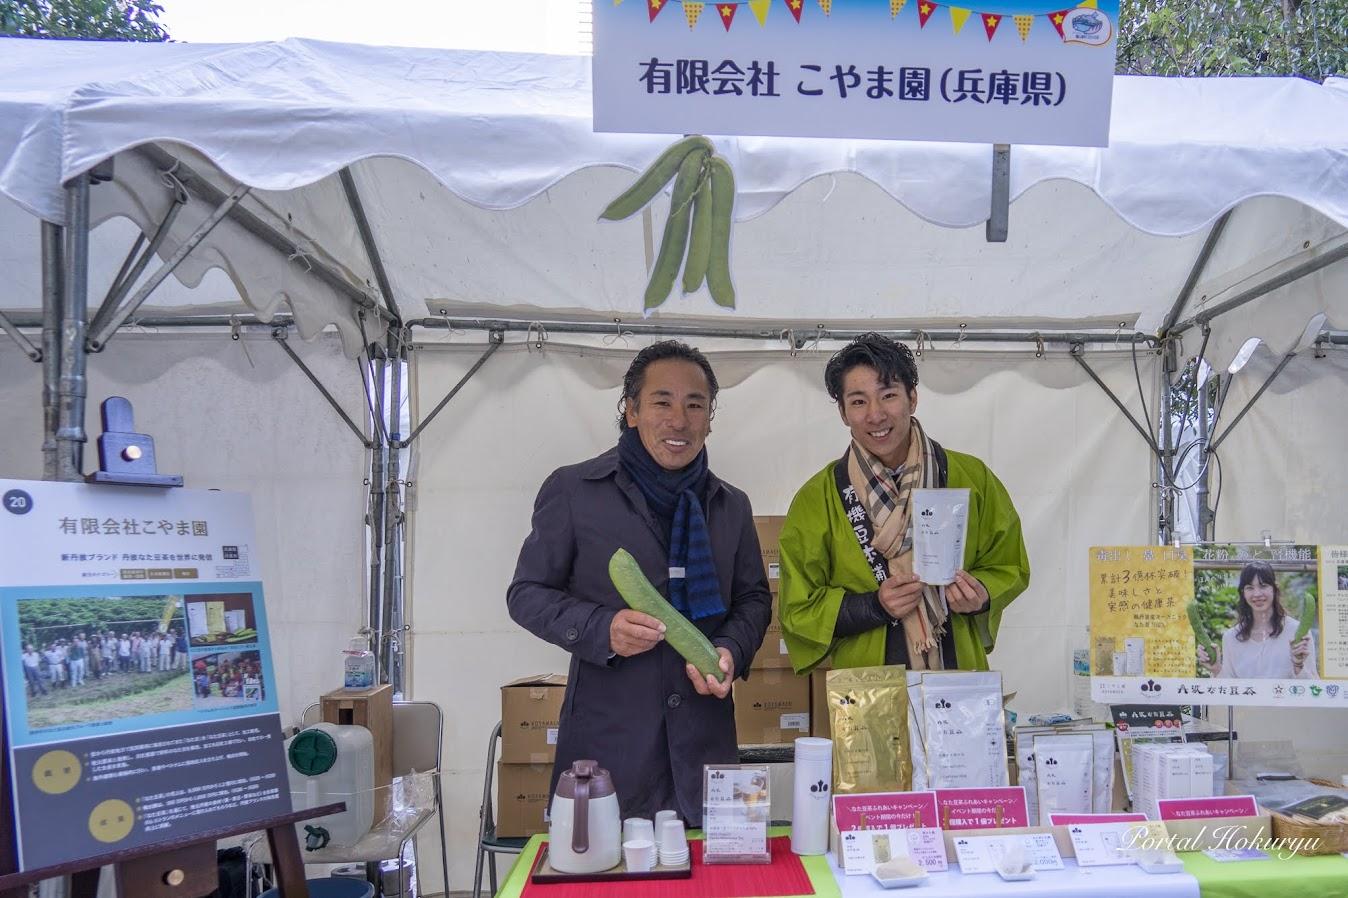 小山伸洋 代表取締役社長(左)、小山海さん(右)有限会社 こやま園 (兵庫県丹波市)